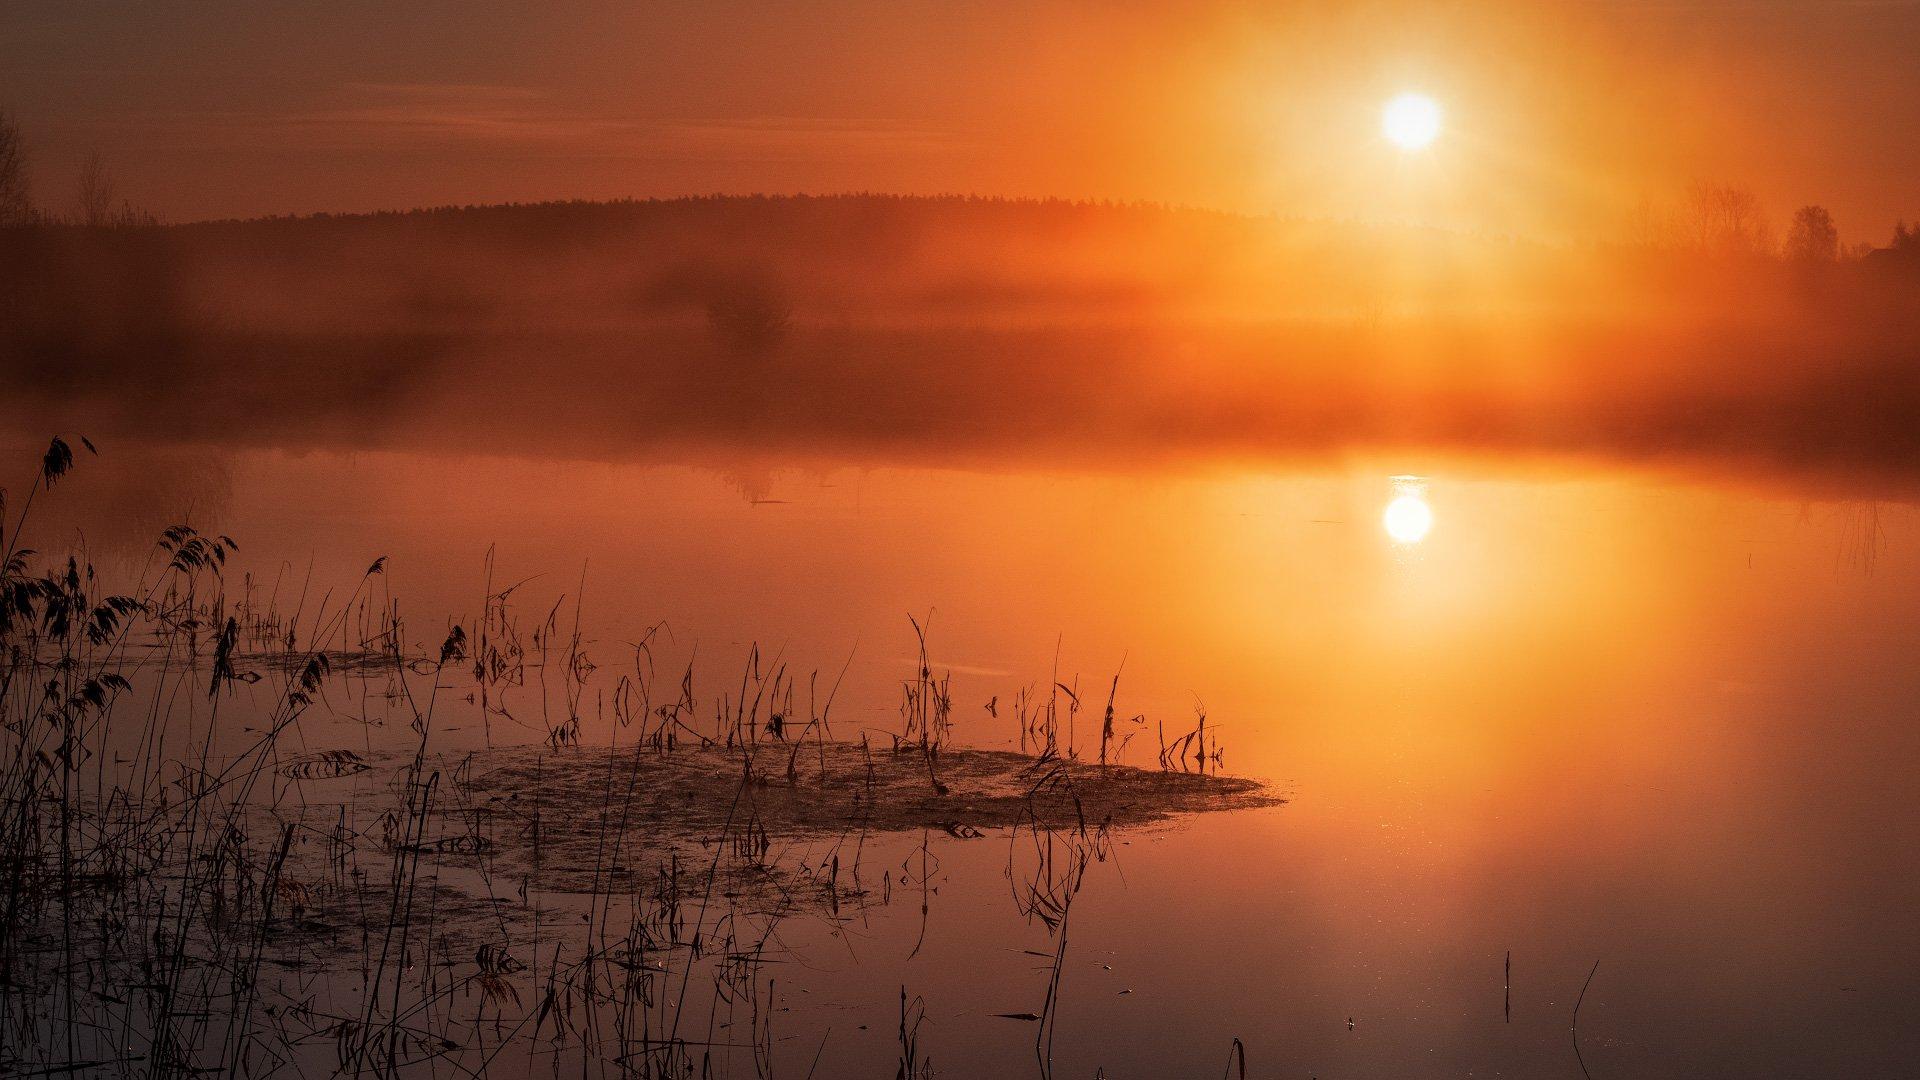 пейзаж, природа, весна, разлив, утро, рассвет, туман, солнце, восход, Андрей Чиж